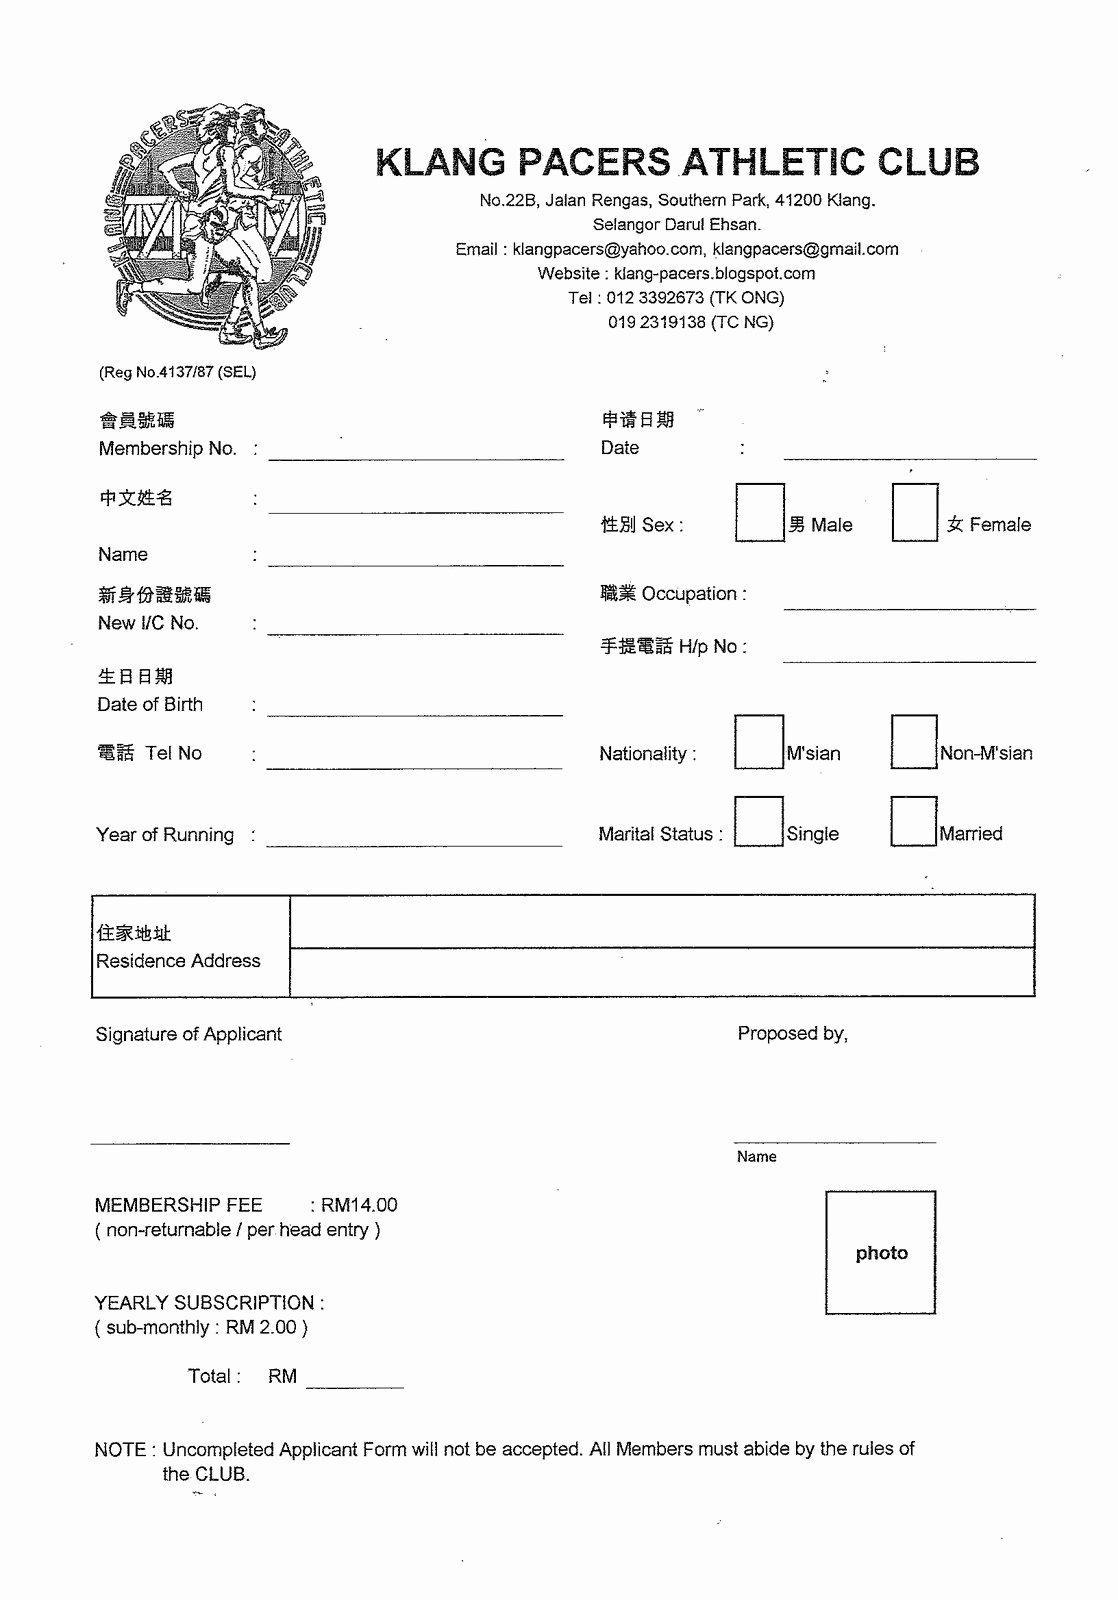 Club Application Template Elegant Application form Application form Template for Membership